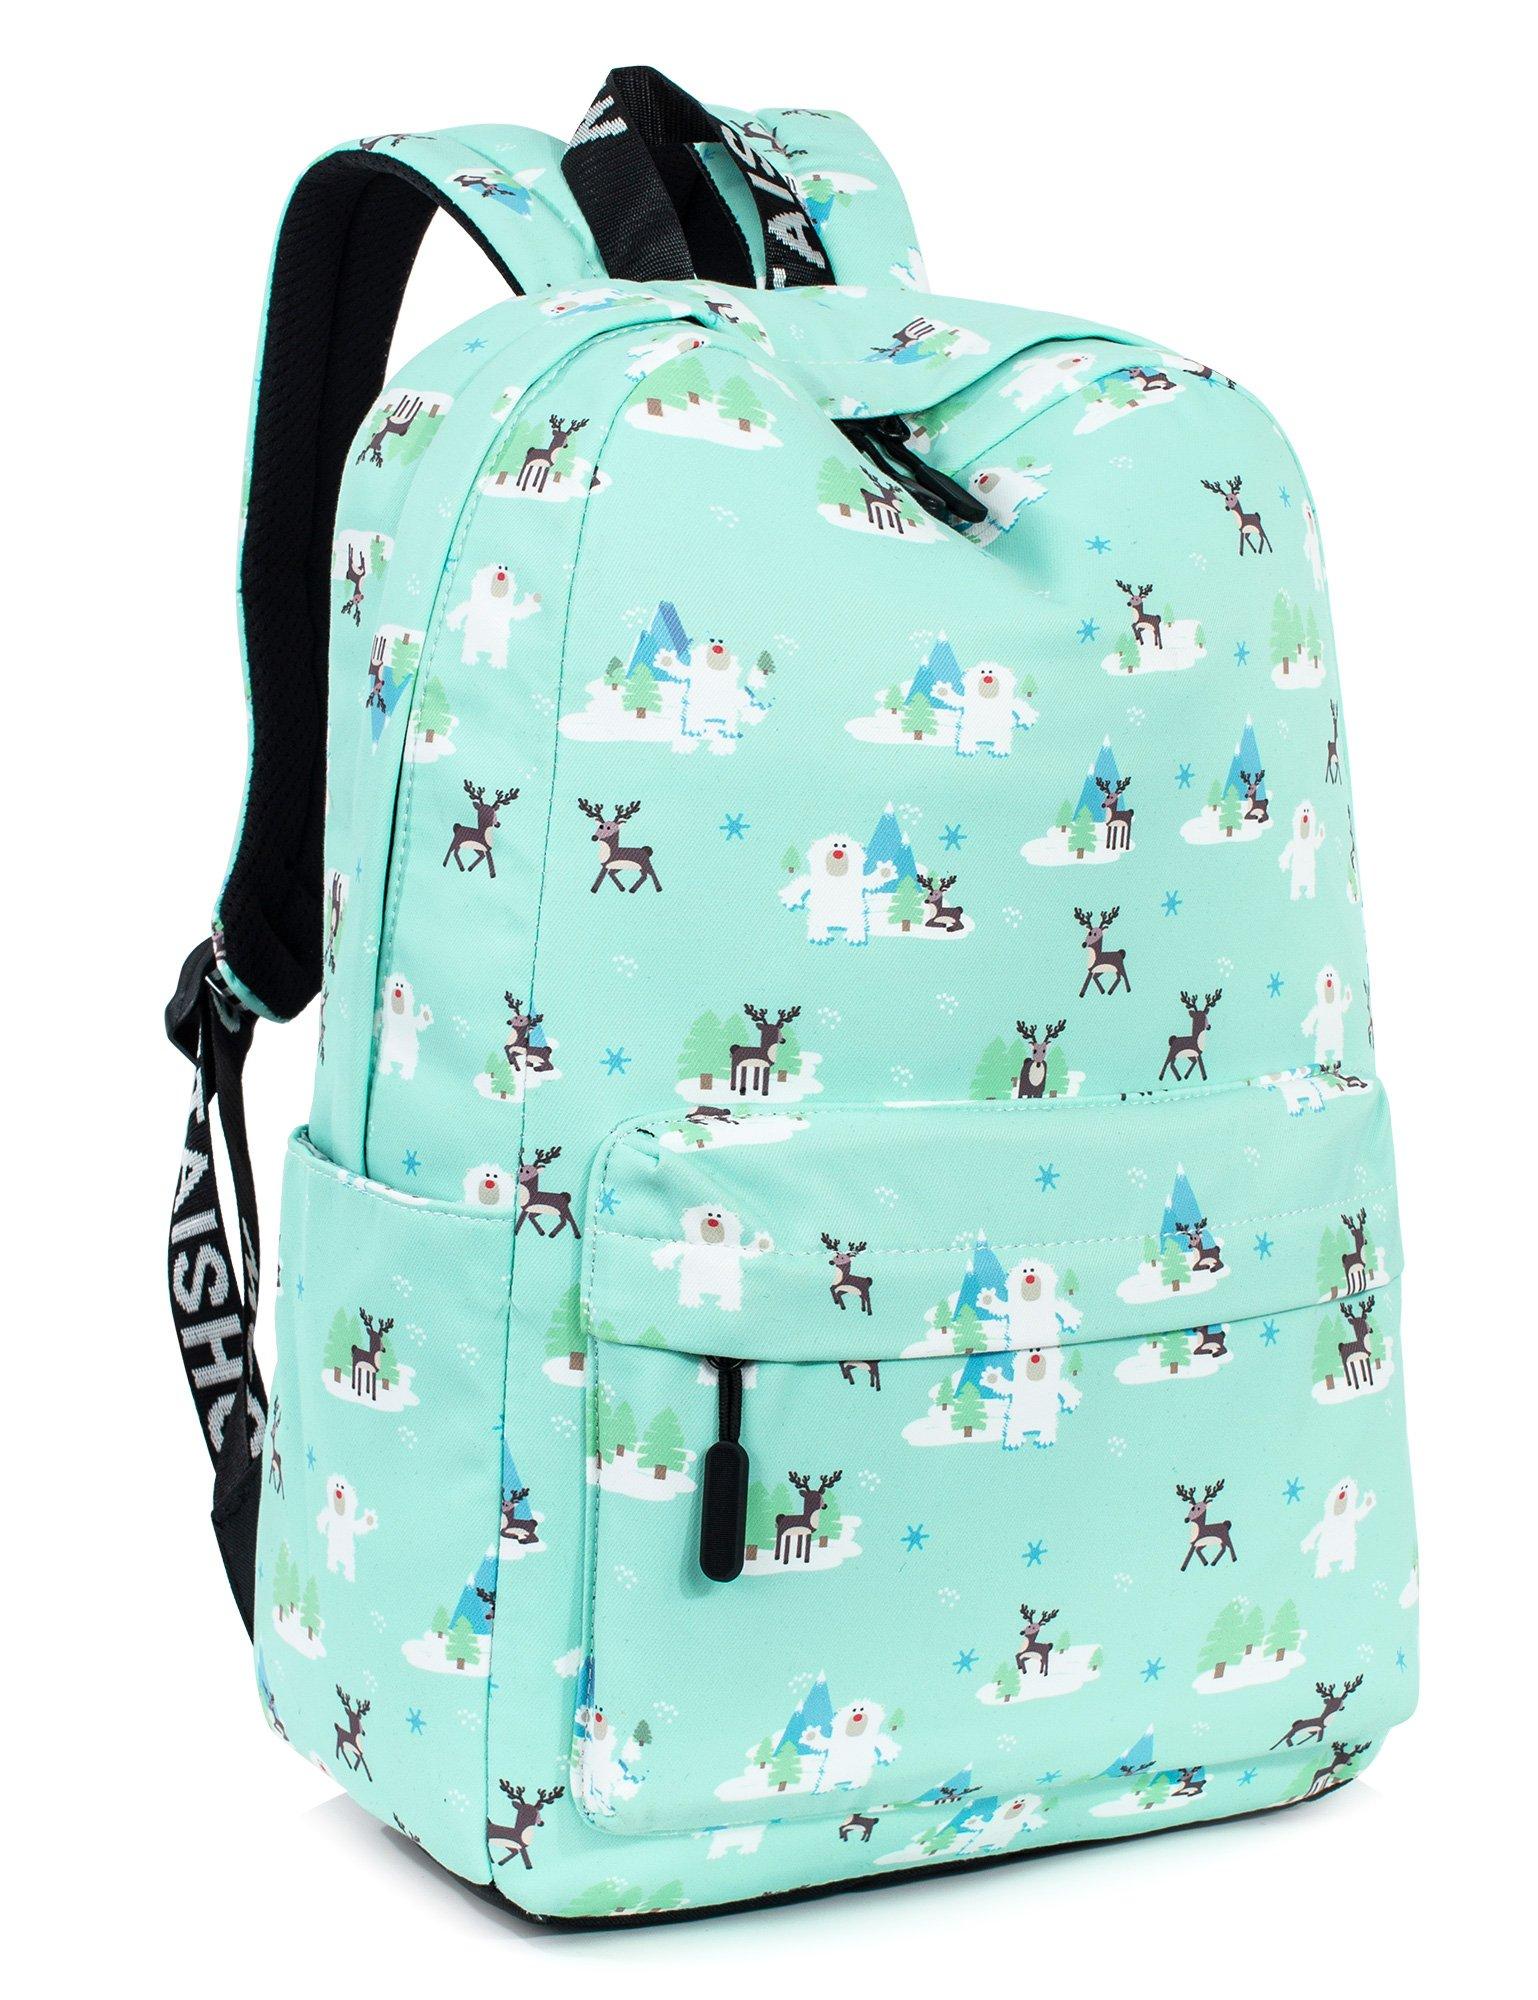 7401def6851 Galleon - Cute Deer Laptop Backpack For Women, Travel Bag School Backpack  For Girls Daypack By Leaper (Green Deer)